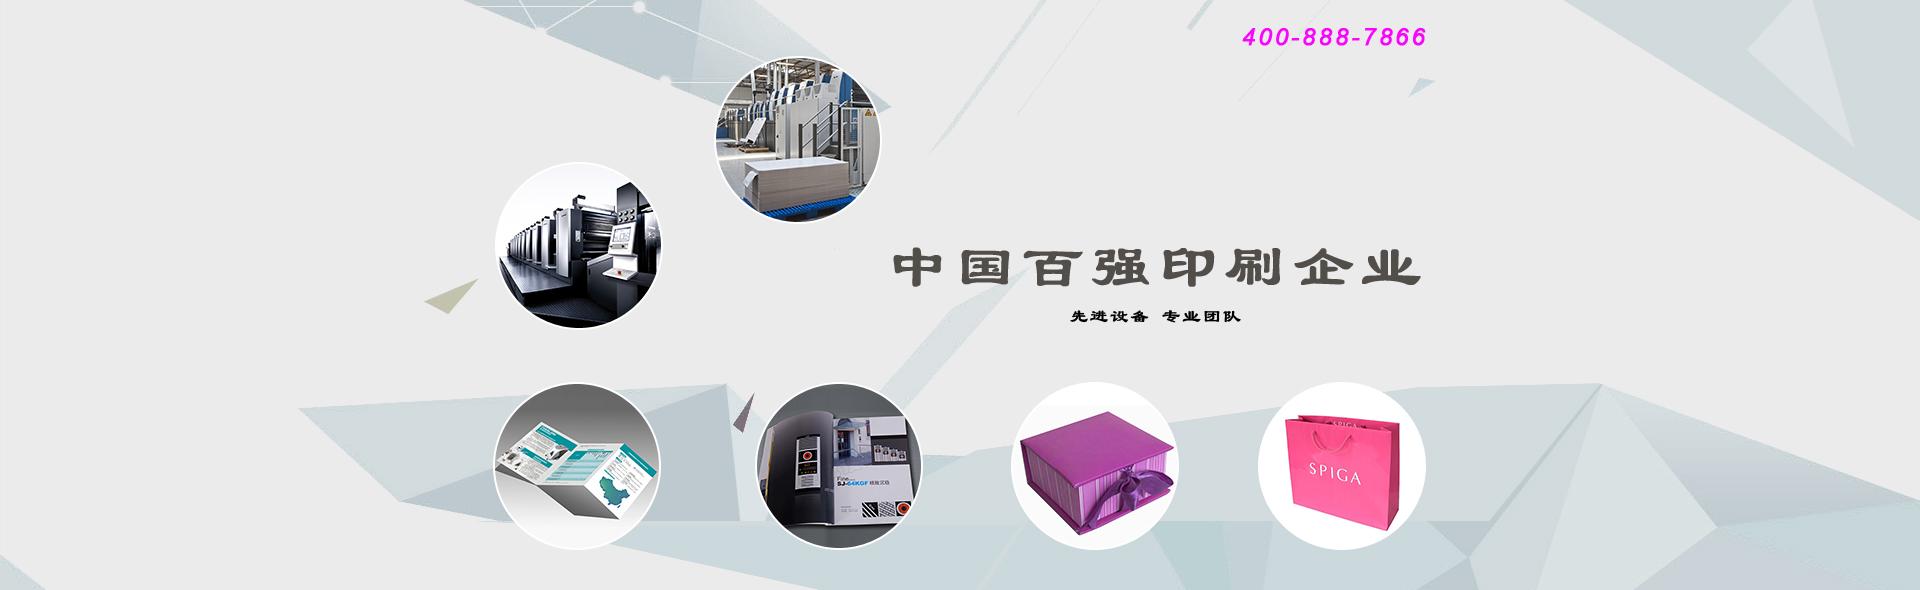 深圳龙8官方网站印刷